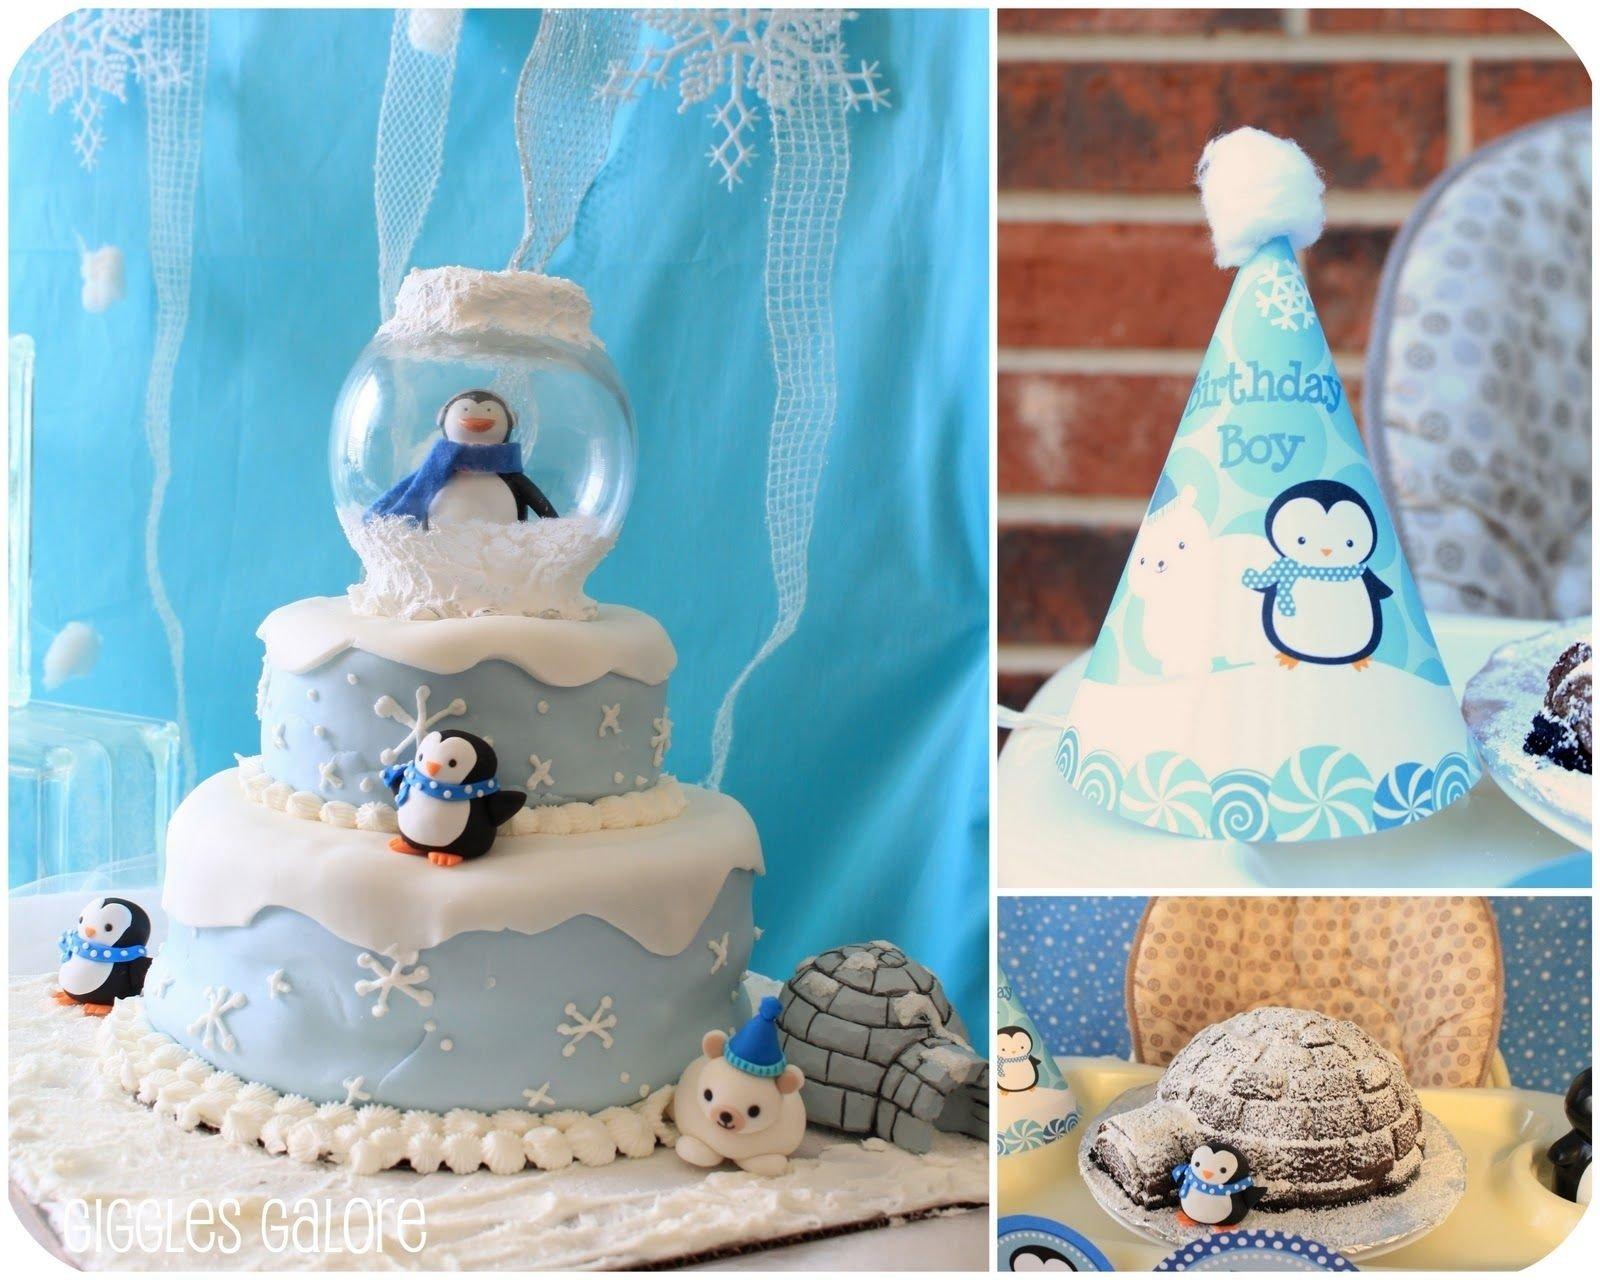 10 Great Winter Wonderland Birthday Party Ideas penguins polar bears winter onederland birthday party winter 2 2021